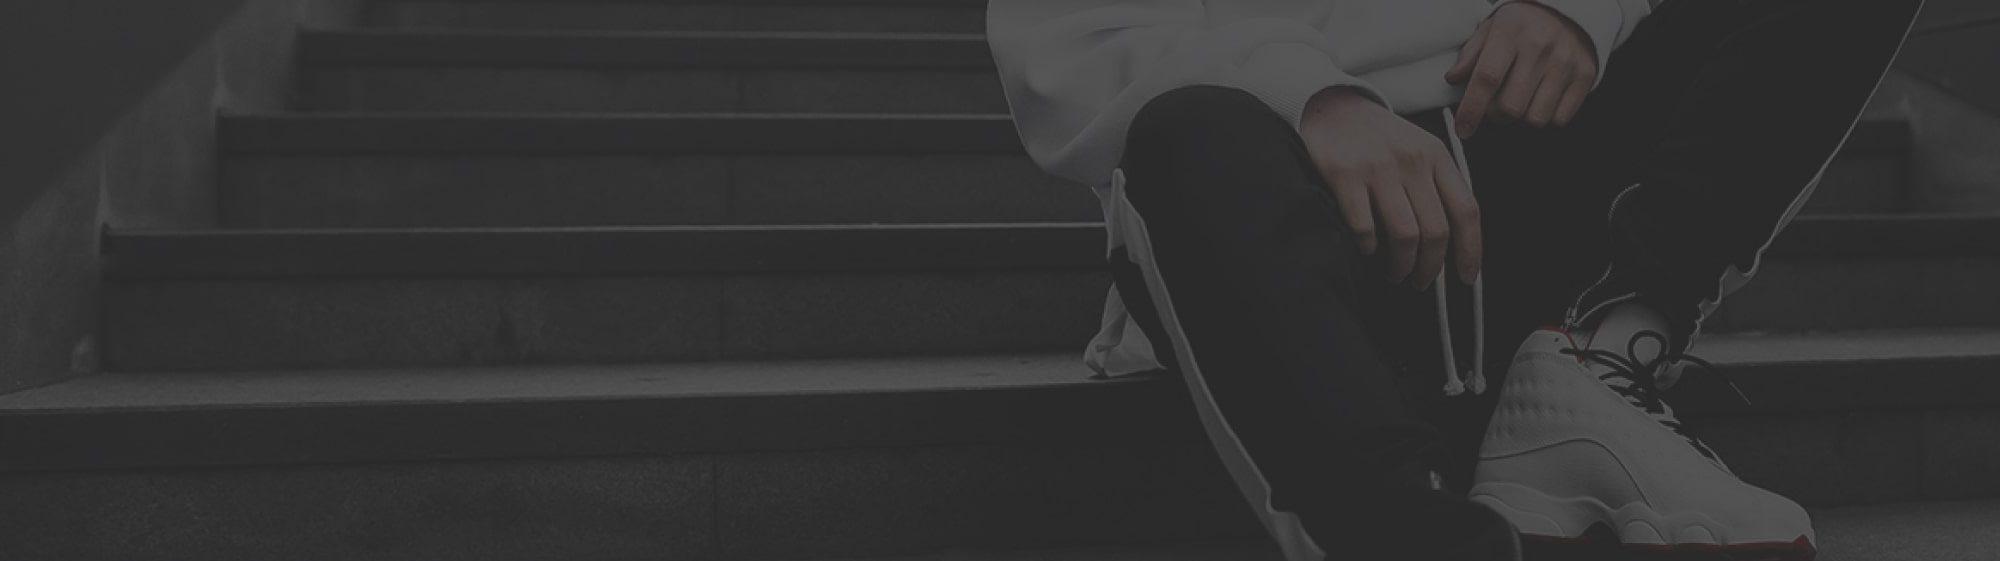 usercase-karmaloop-heading-min